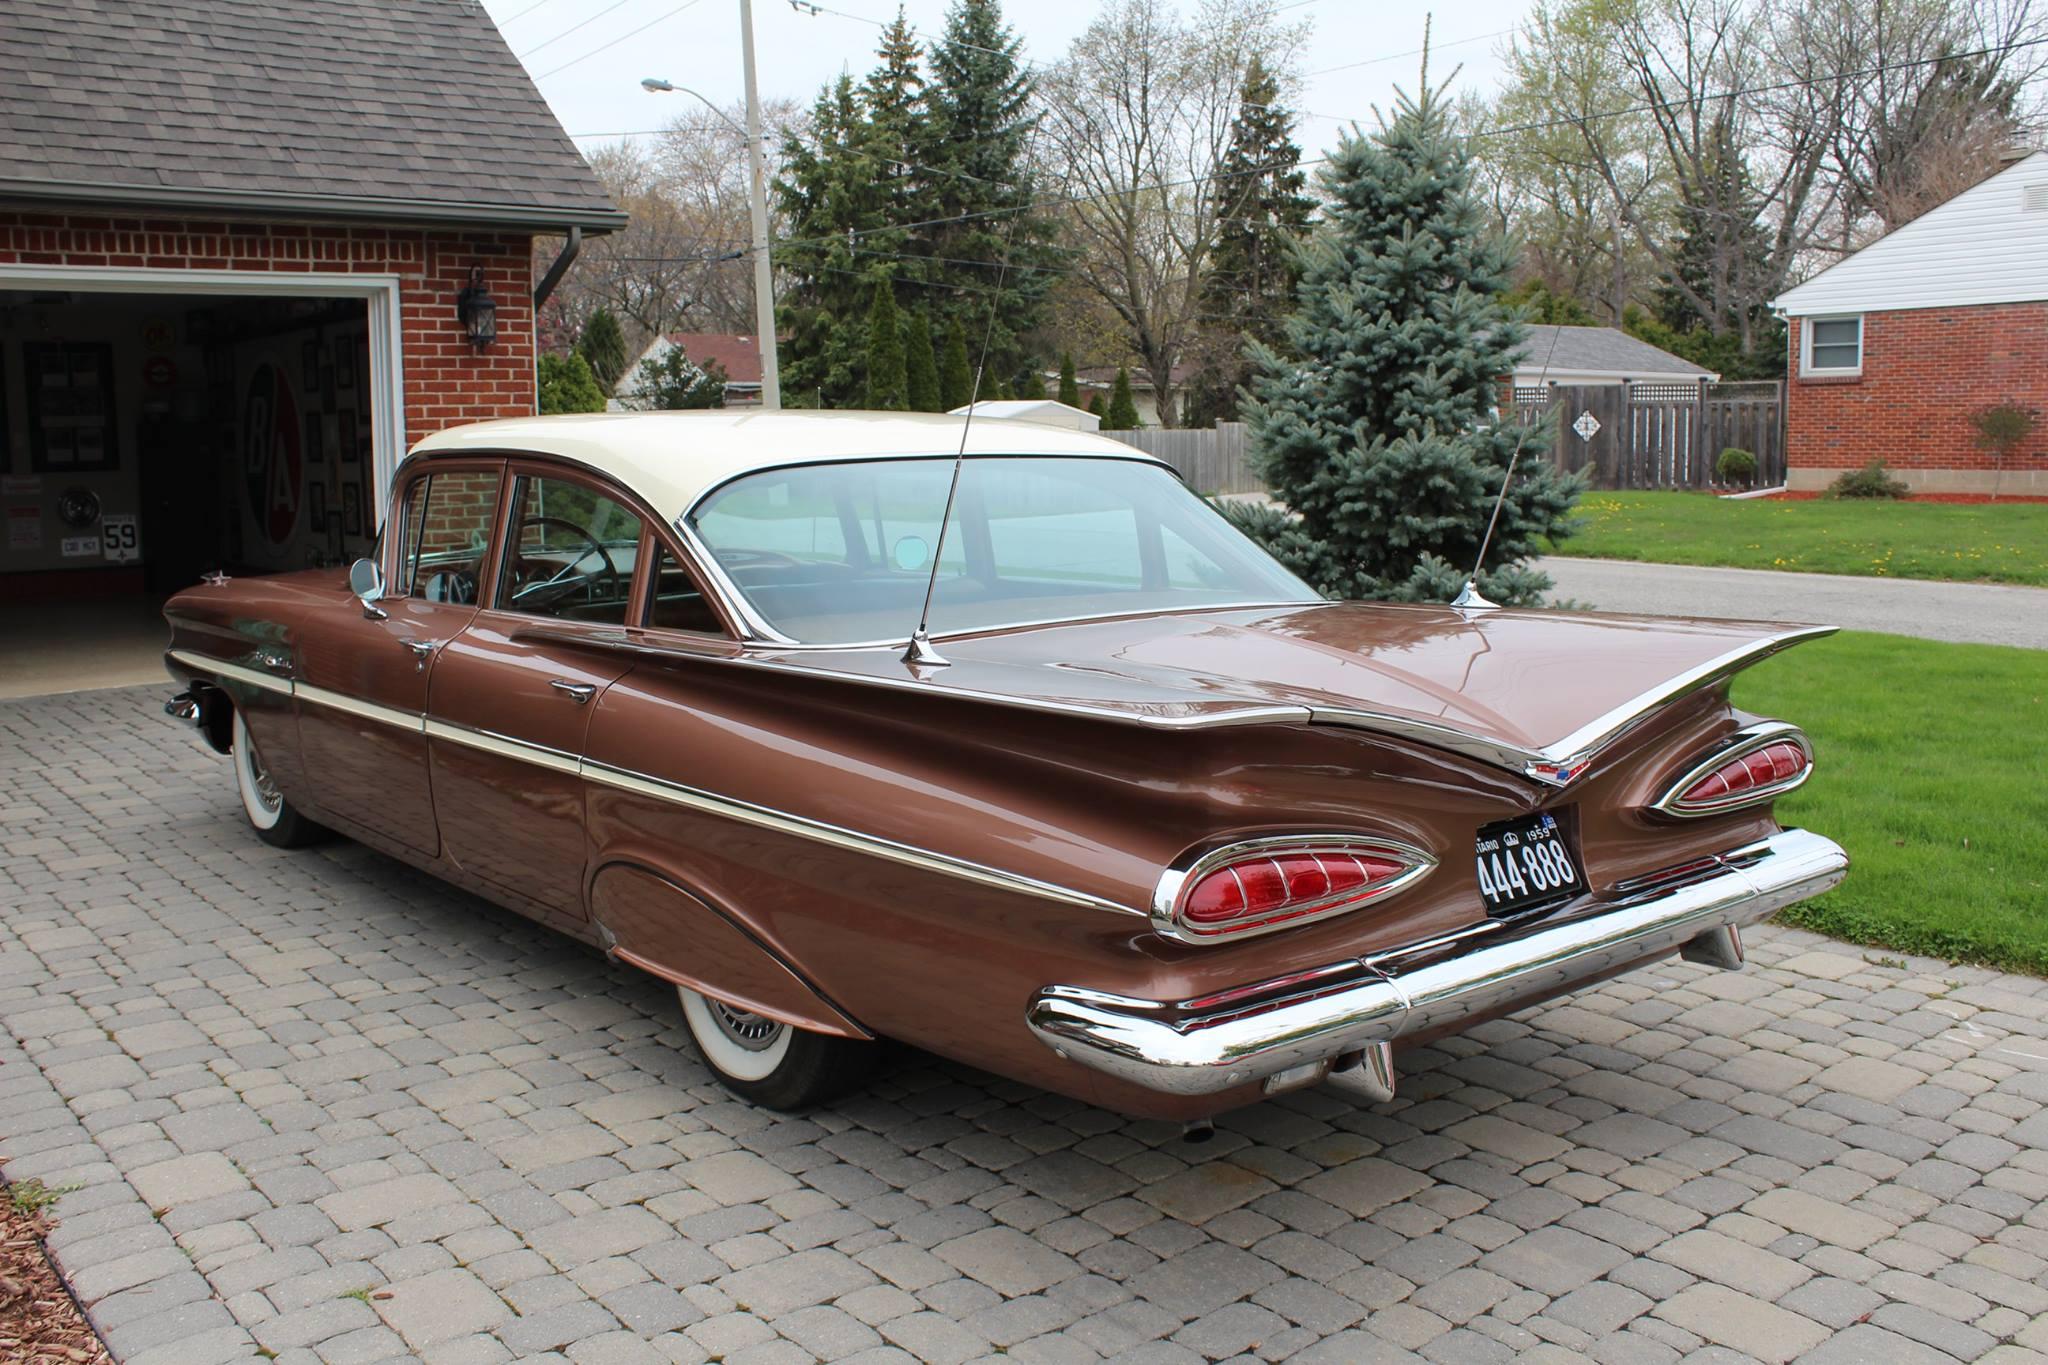 1959 Chevrolet Bel Air rear three quarter